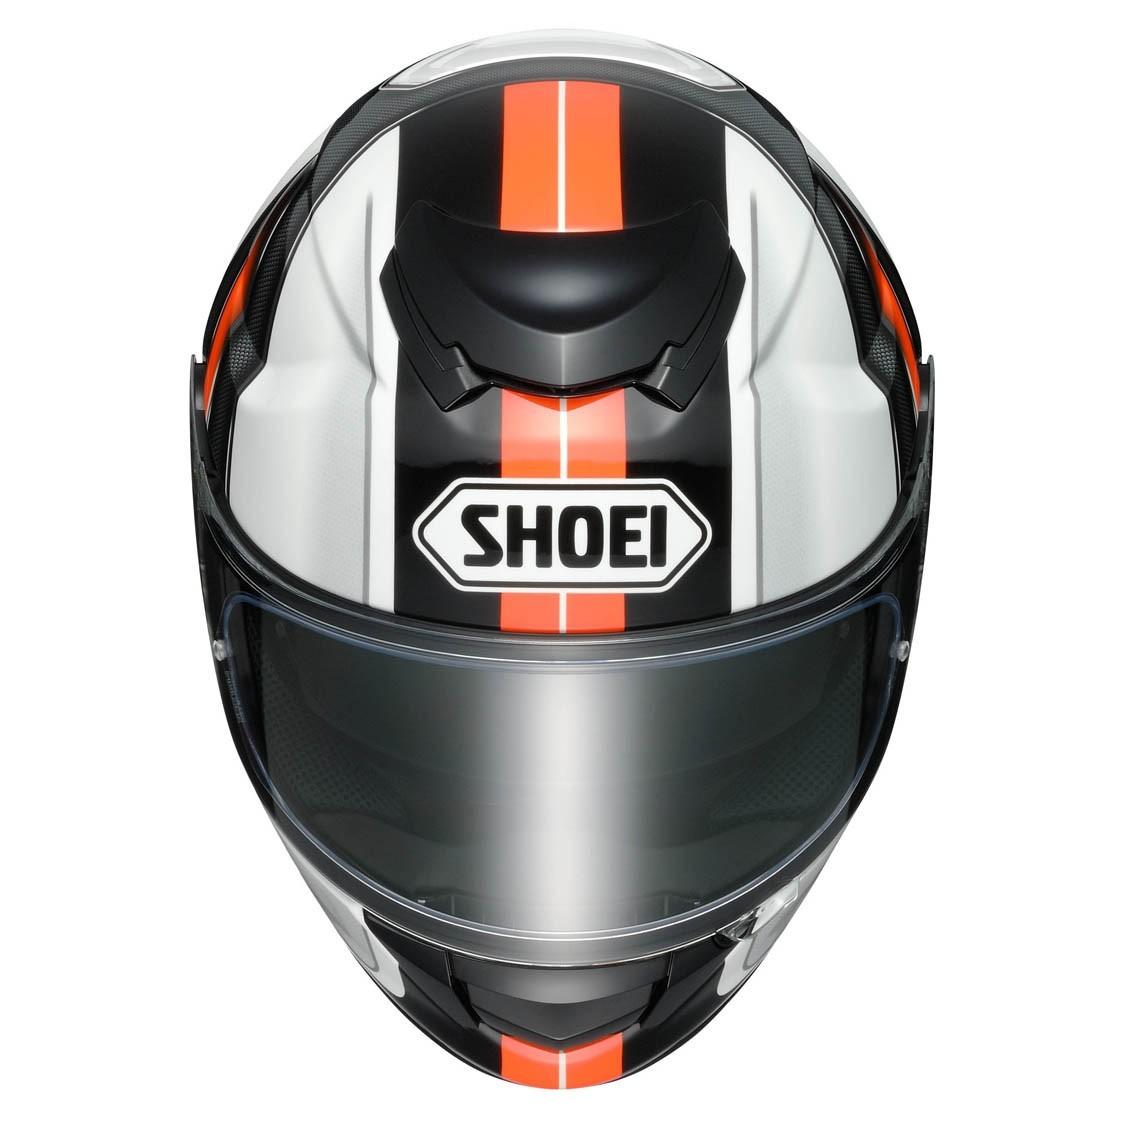 Capacete Shoei GT-Air Dauntless TC-8 c/ Pinlock Anti-Embassante!  - Nova Suzuki Motos e Acessórios